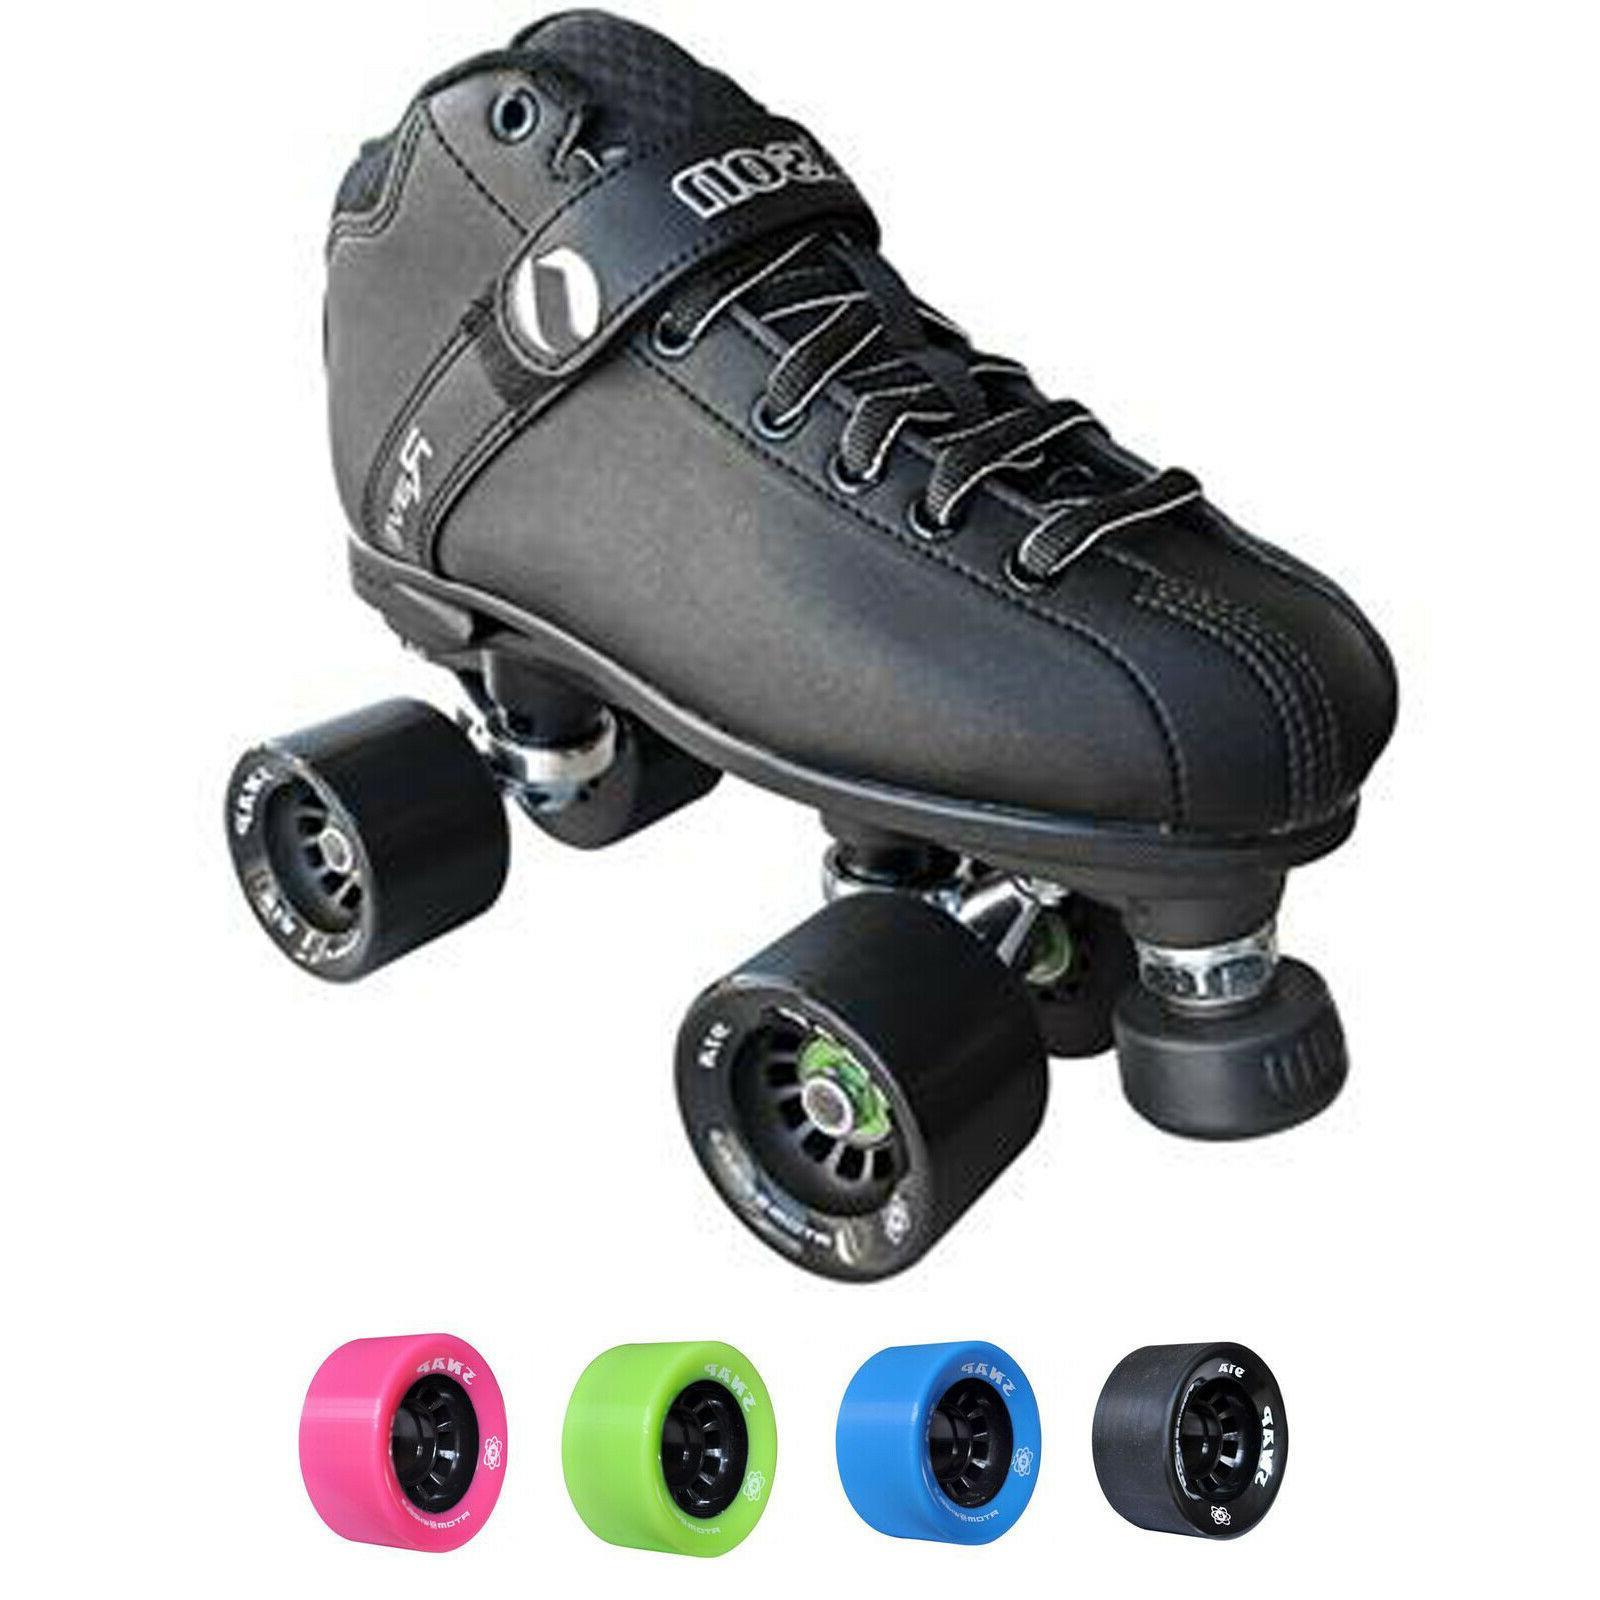 rave rink quad skate package jackson skates